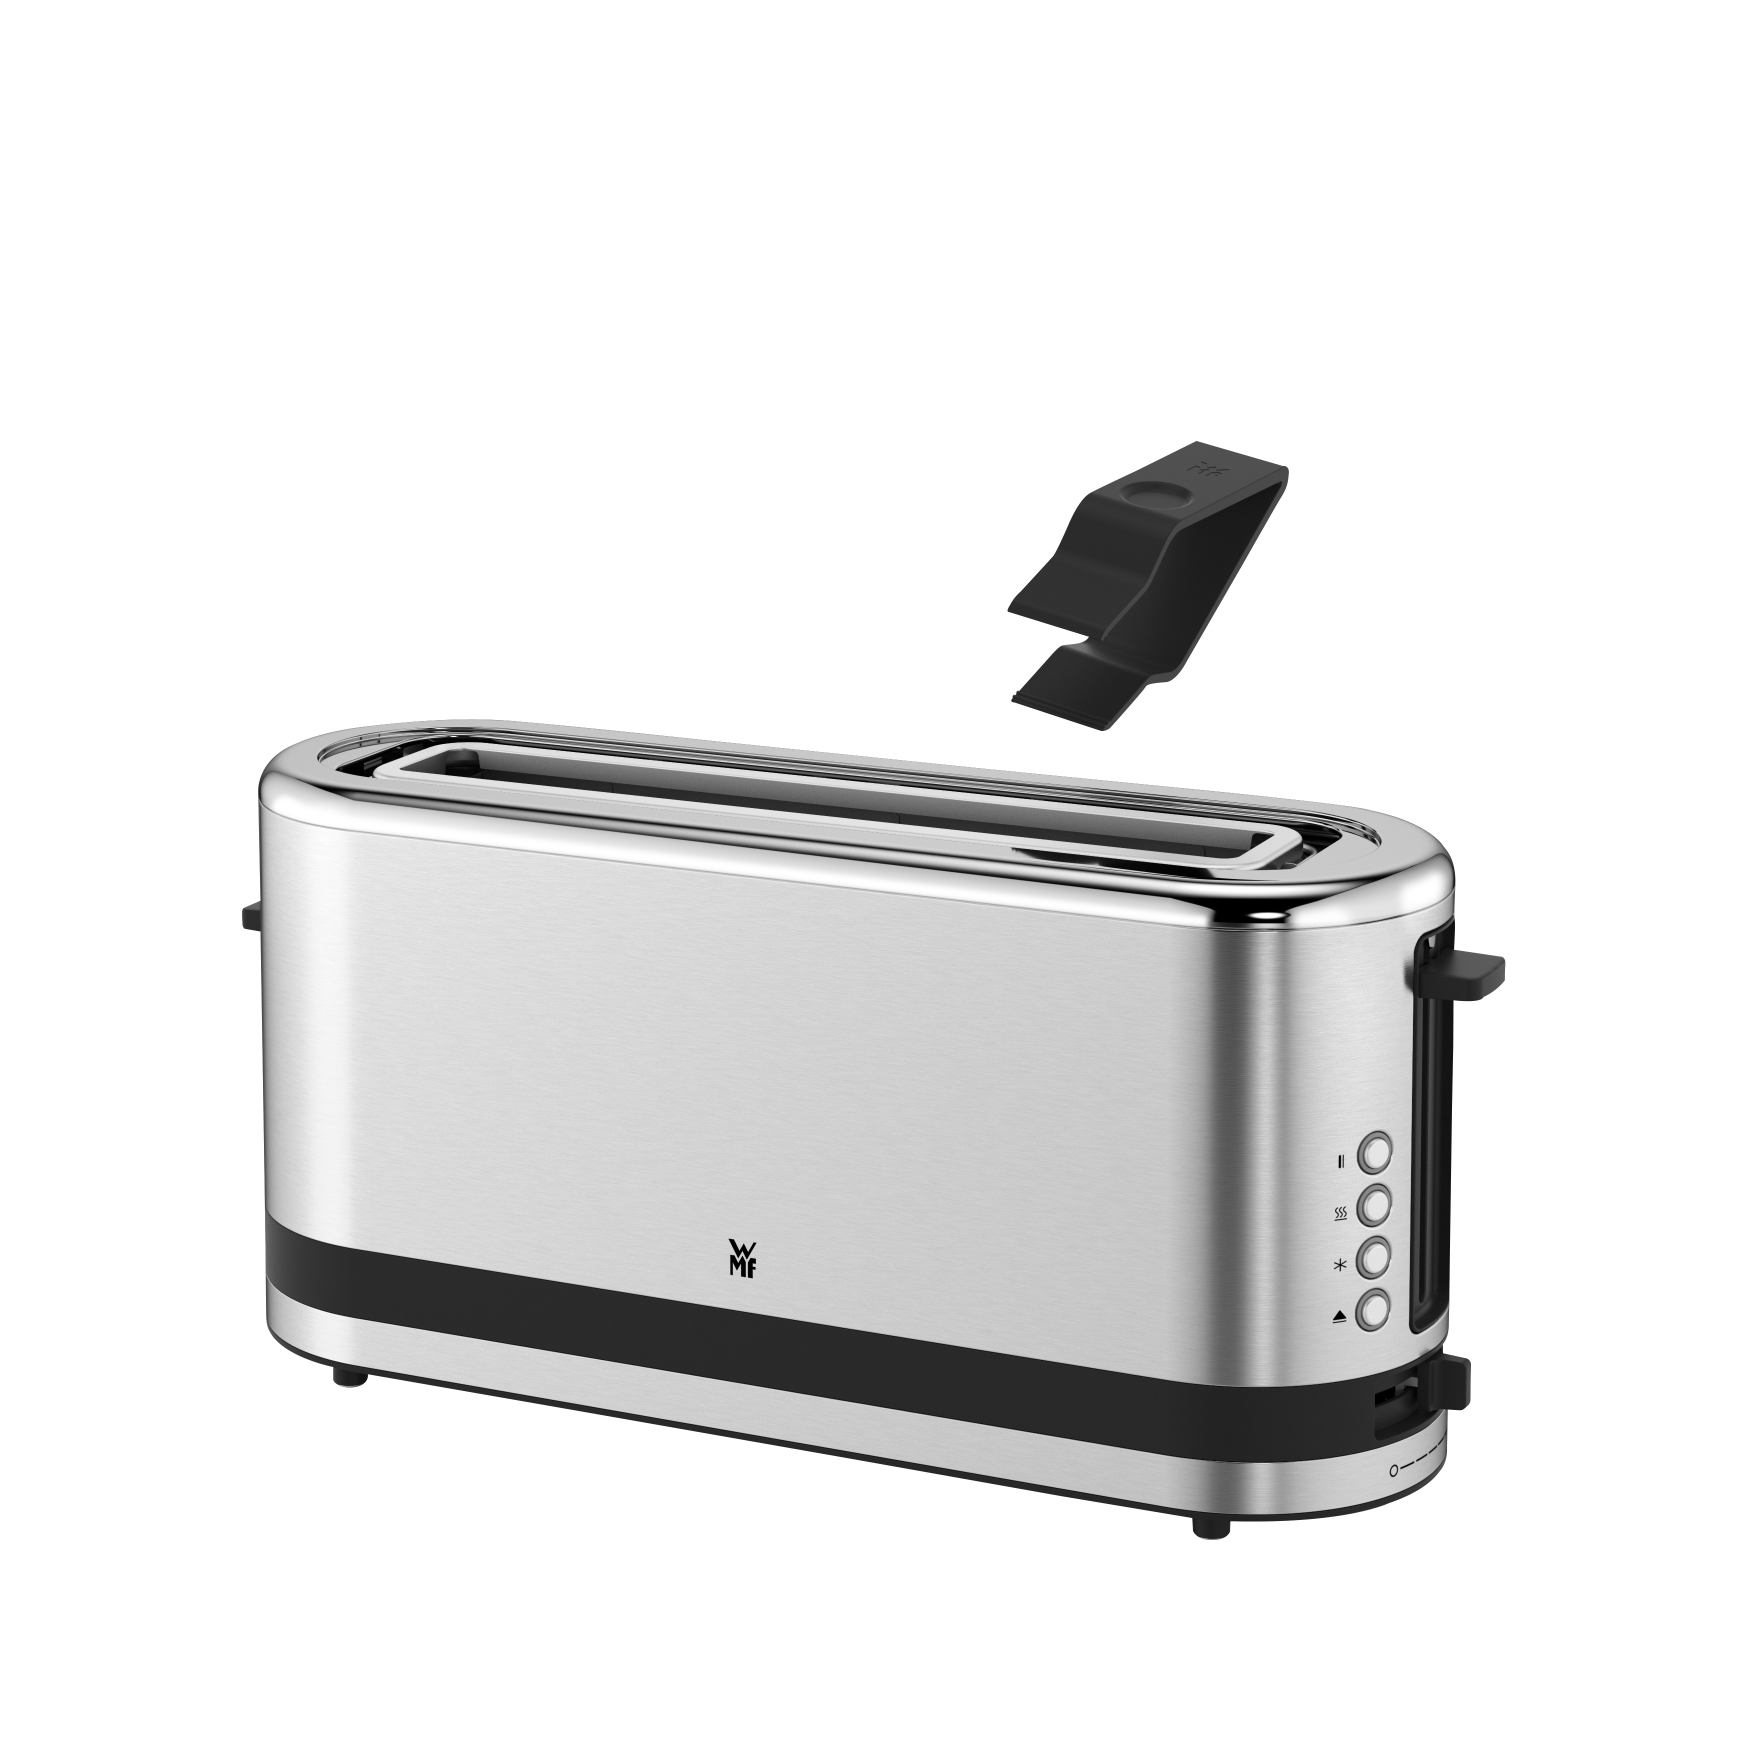 WMF KITCHENminisⓇ Uzun Hazne Ekmek Kızartma Makinesi - Metal